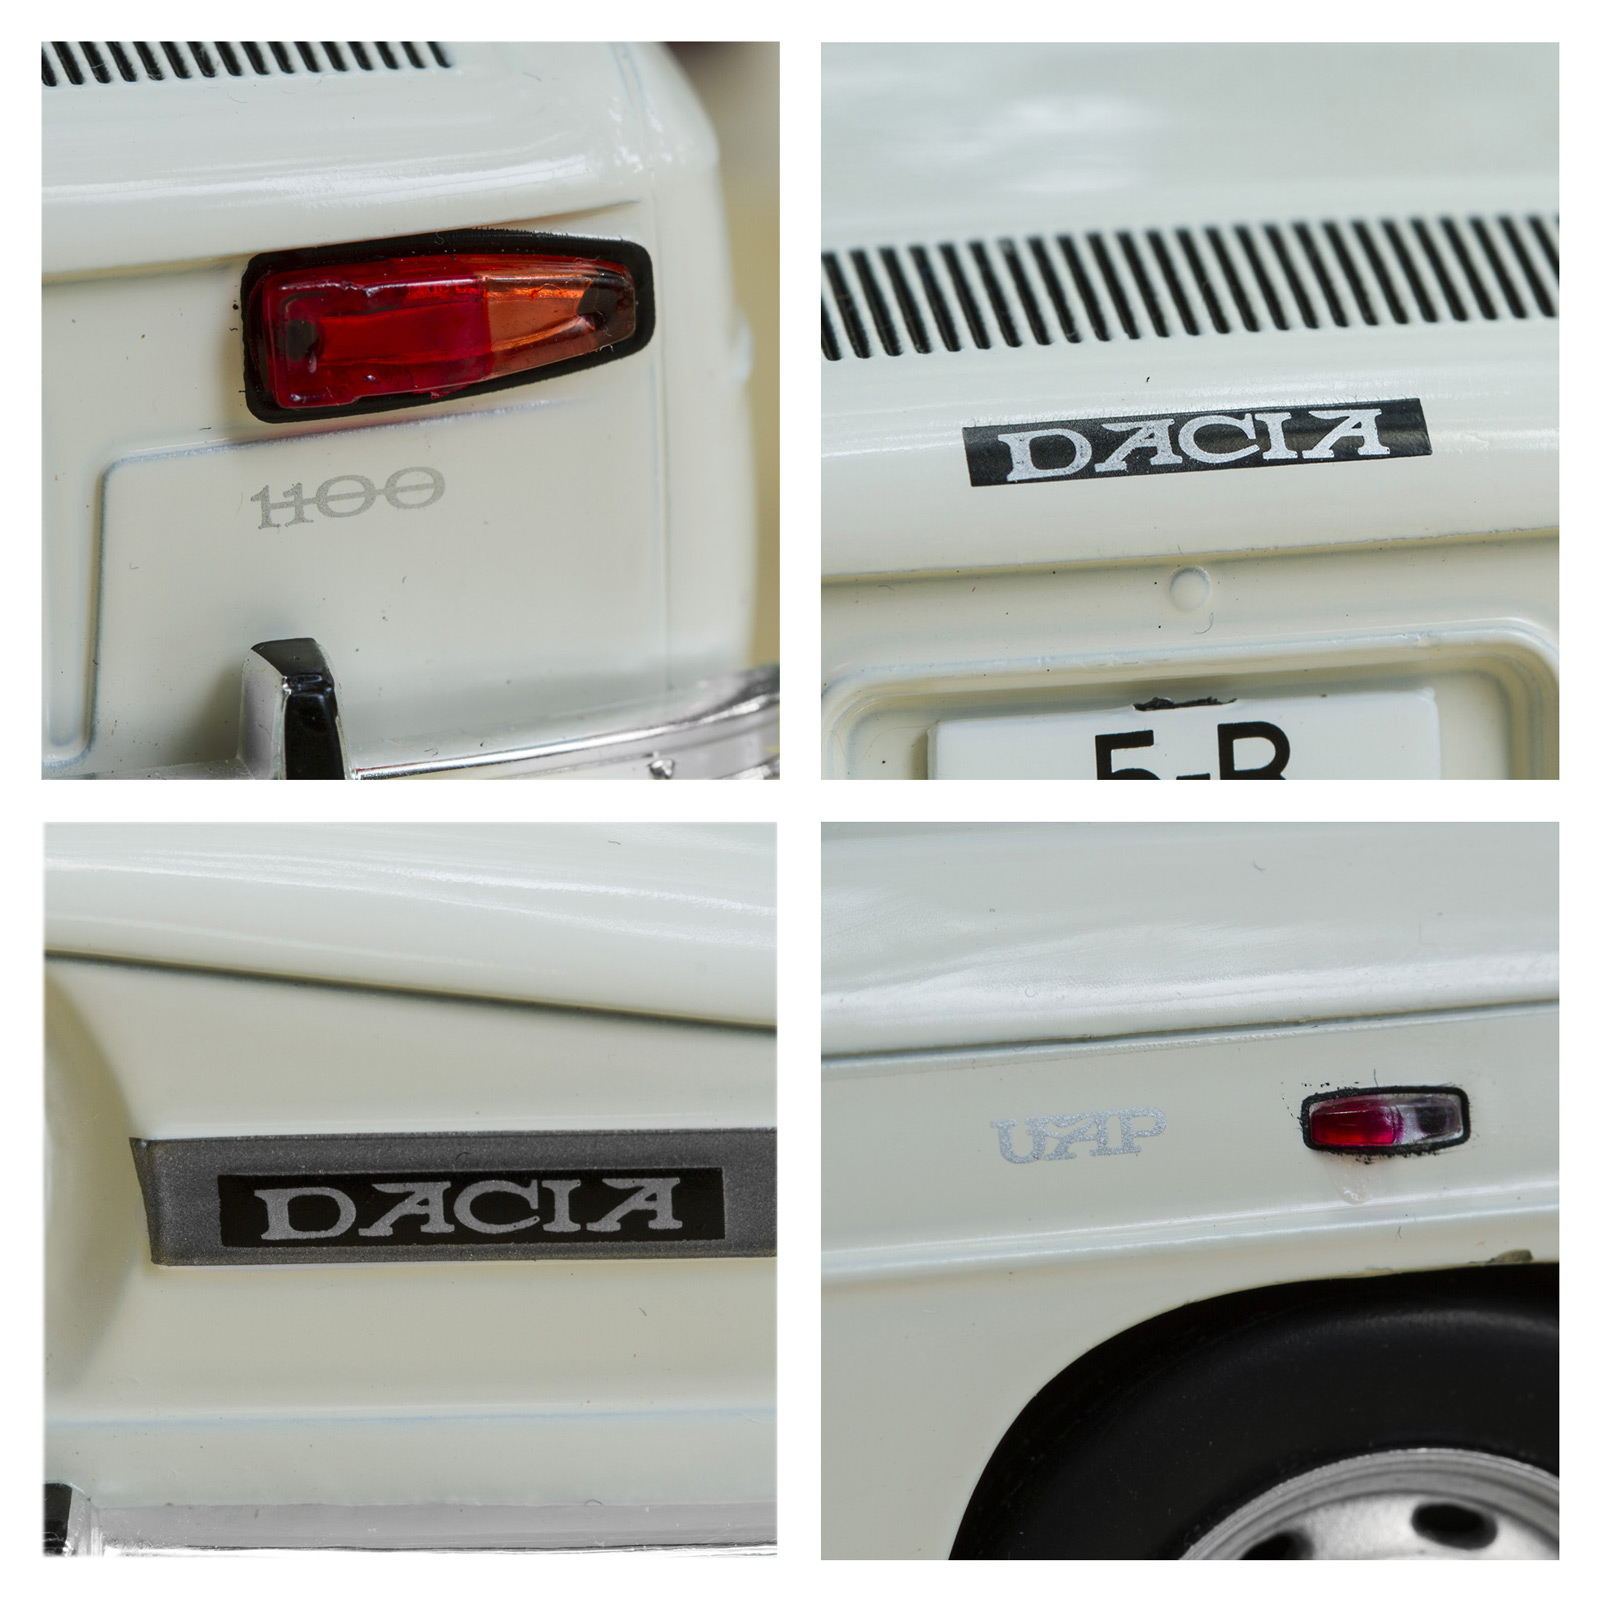 web_Dacia_1100_34